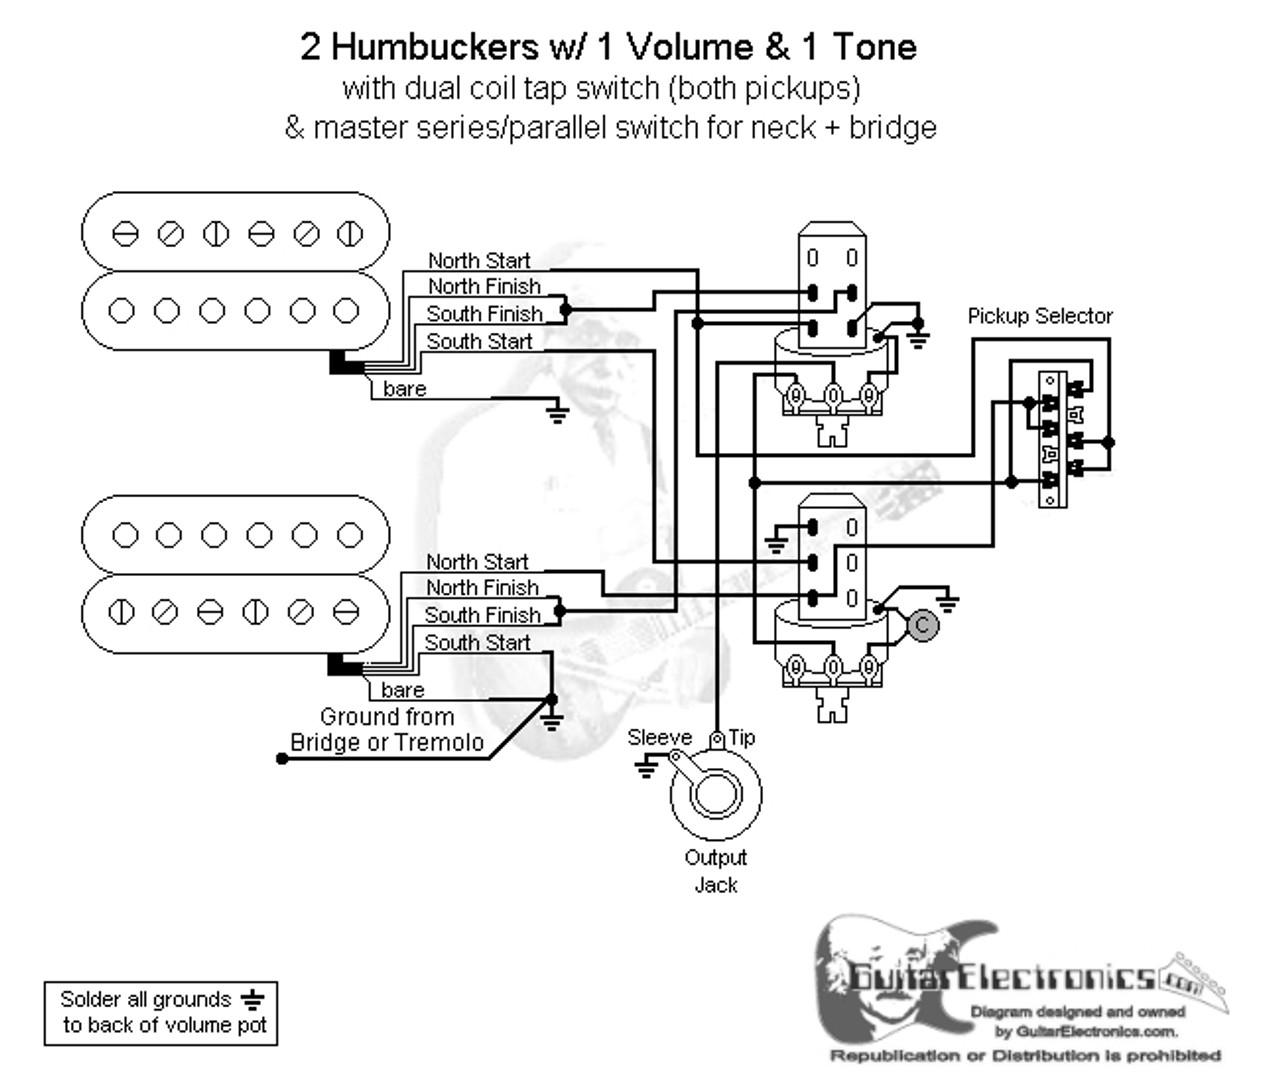 2 hbs 3 way lever 1 vol 1 tone coil tap u0026 series paralleltwo humbucker [ 1280 x 1083 Pixel ]